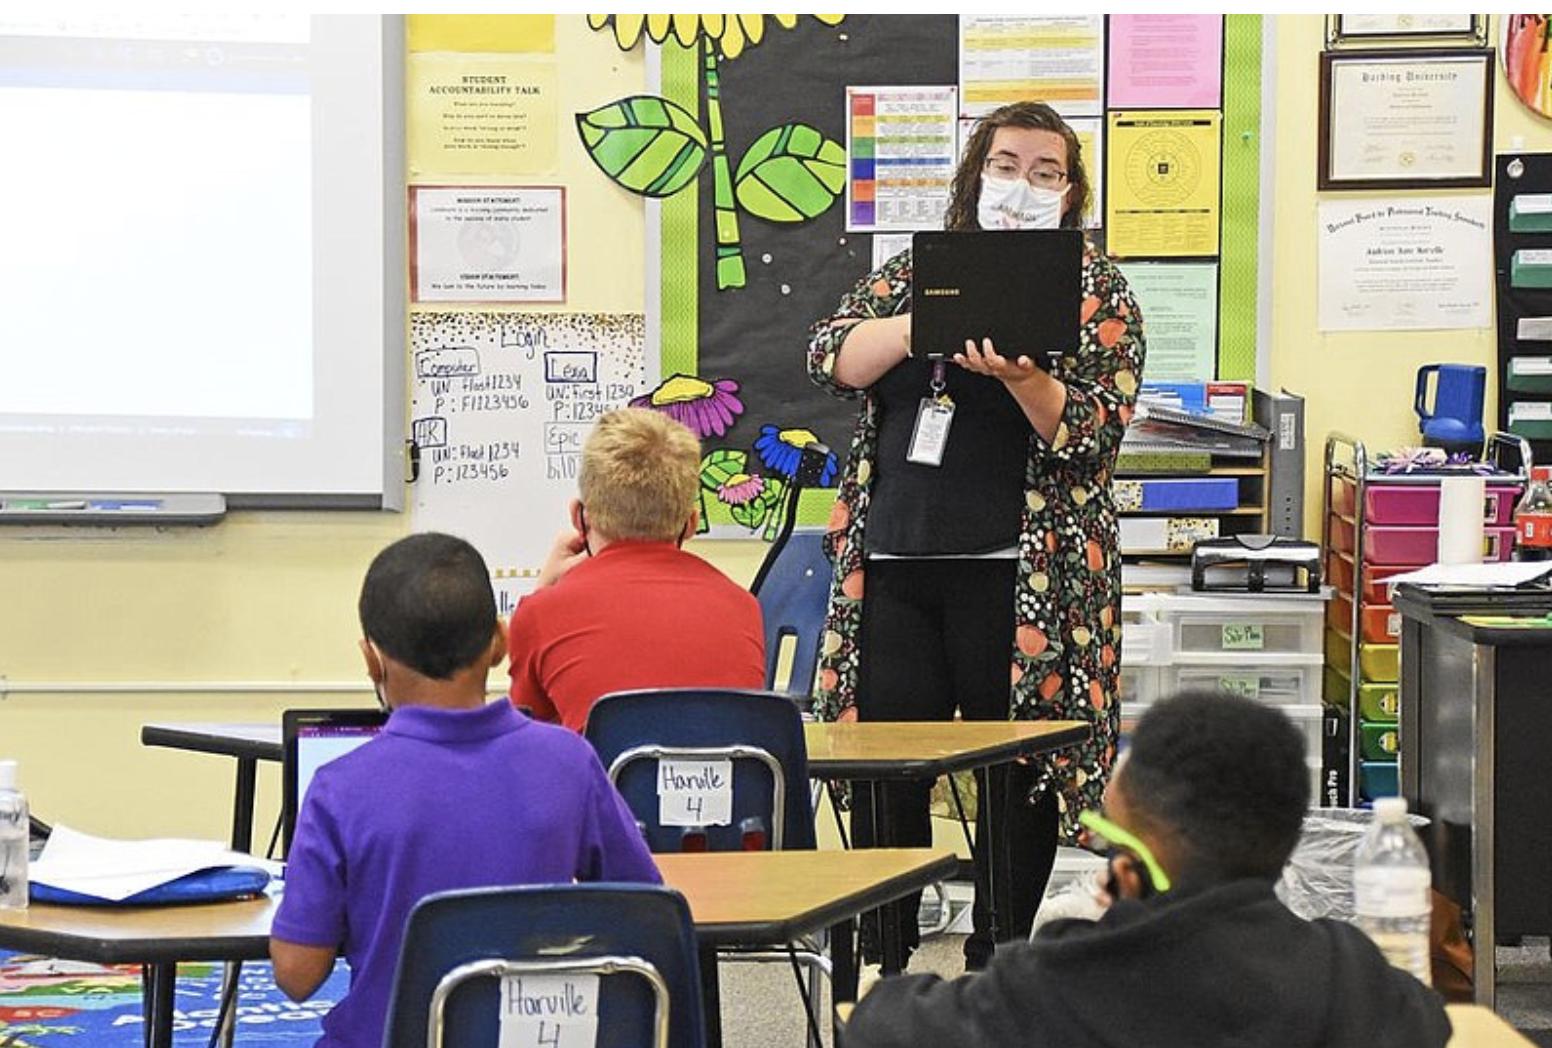 Arkansas Democrat Gazette: School End 1st Week